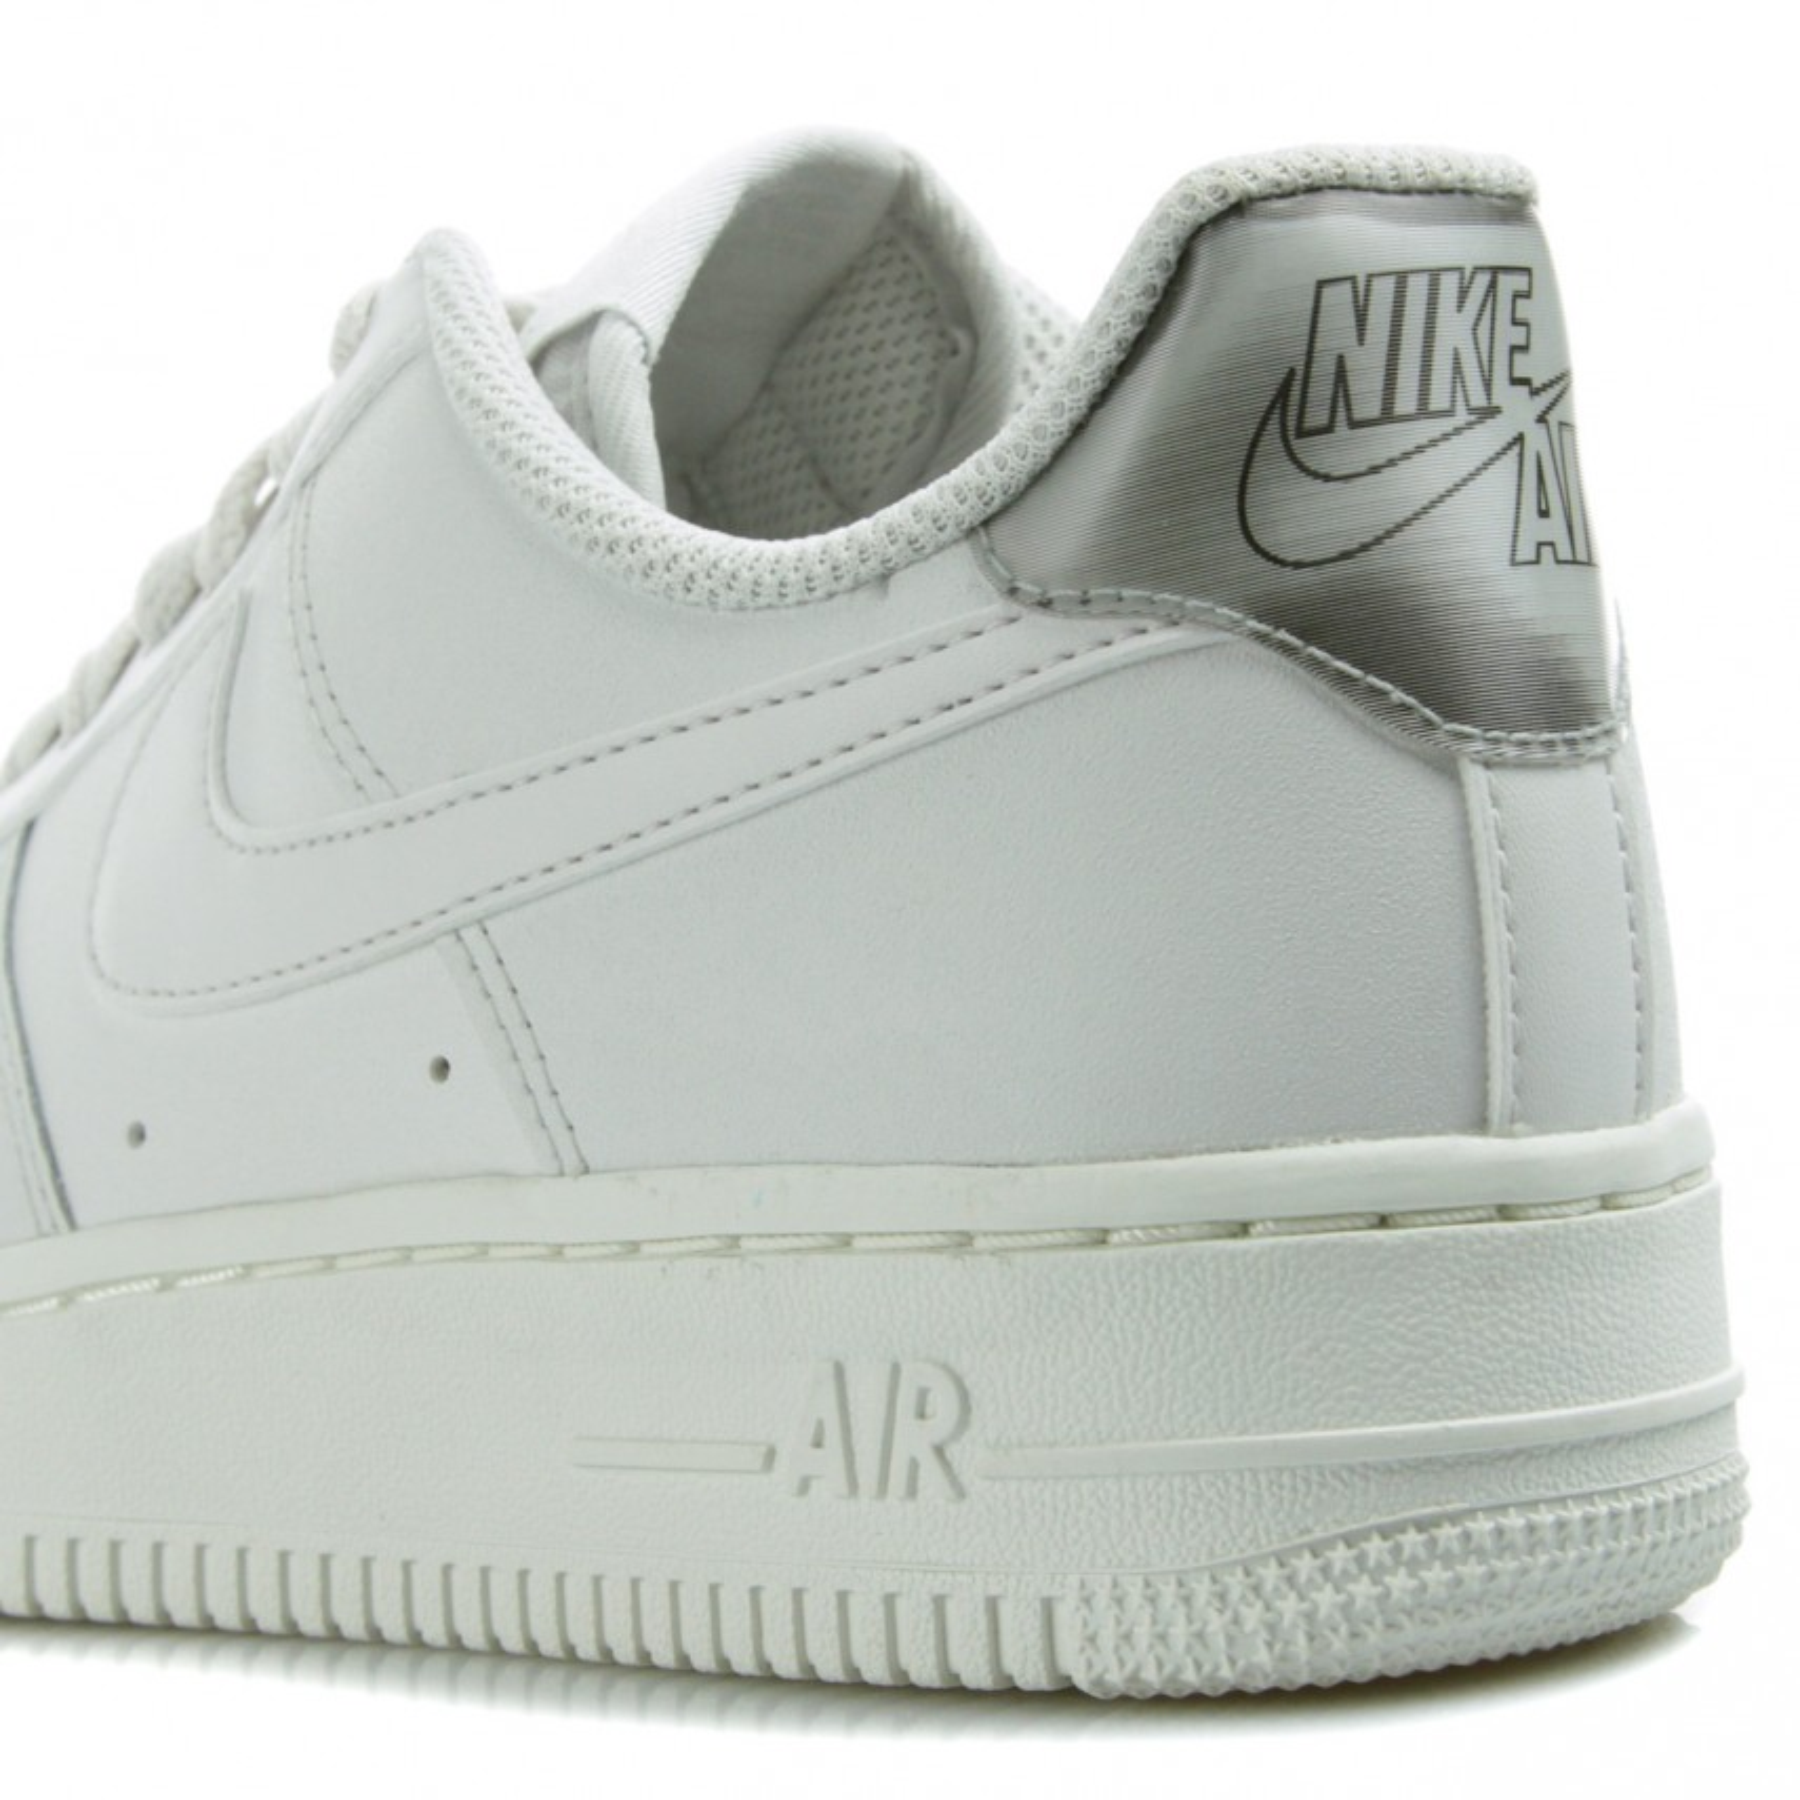 scarpa bassa donna w air force 1 '07 essential PLATINUM TINT/PLATINUM TINT/SUMMIT WHITE